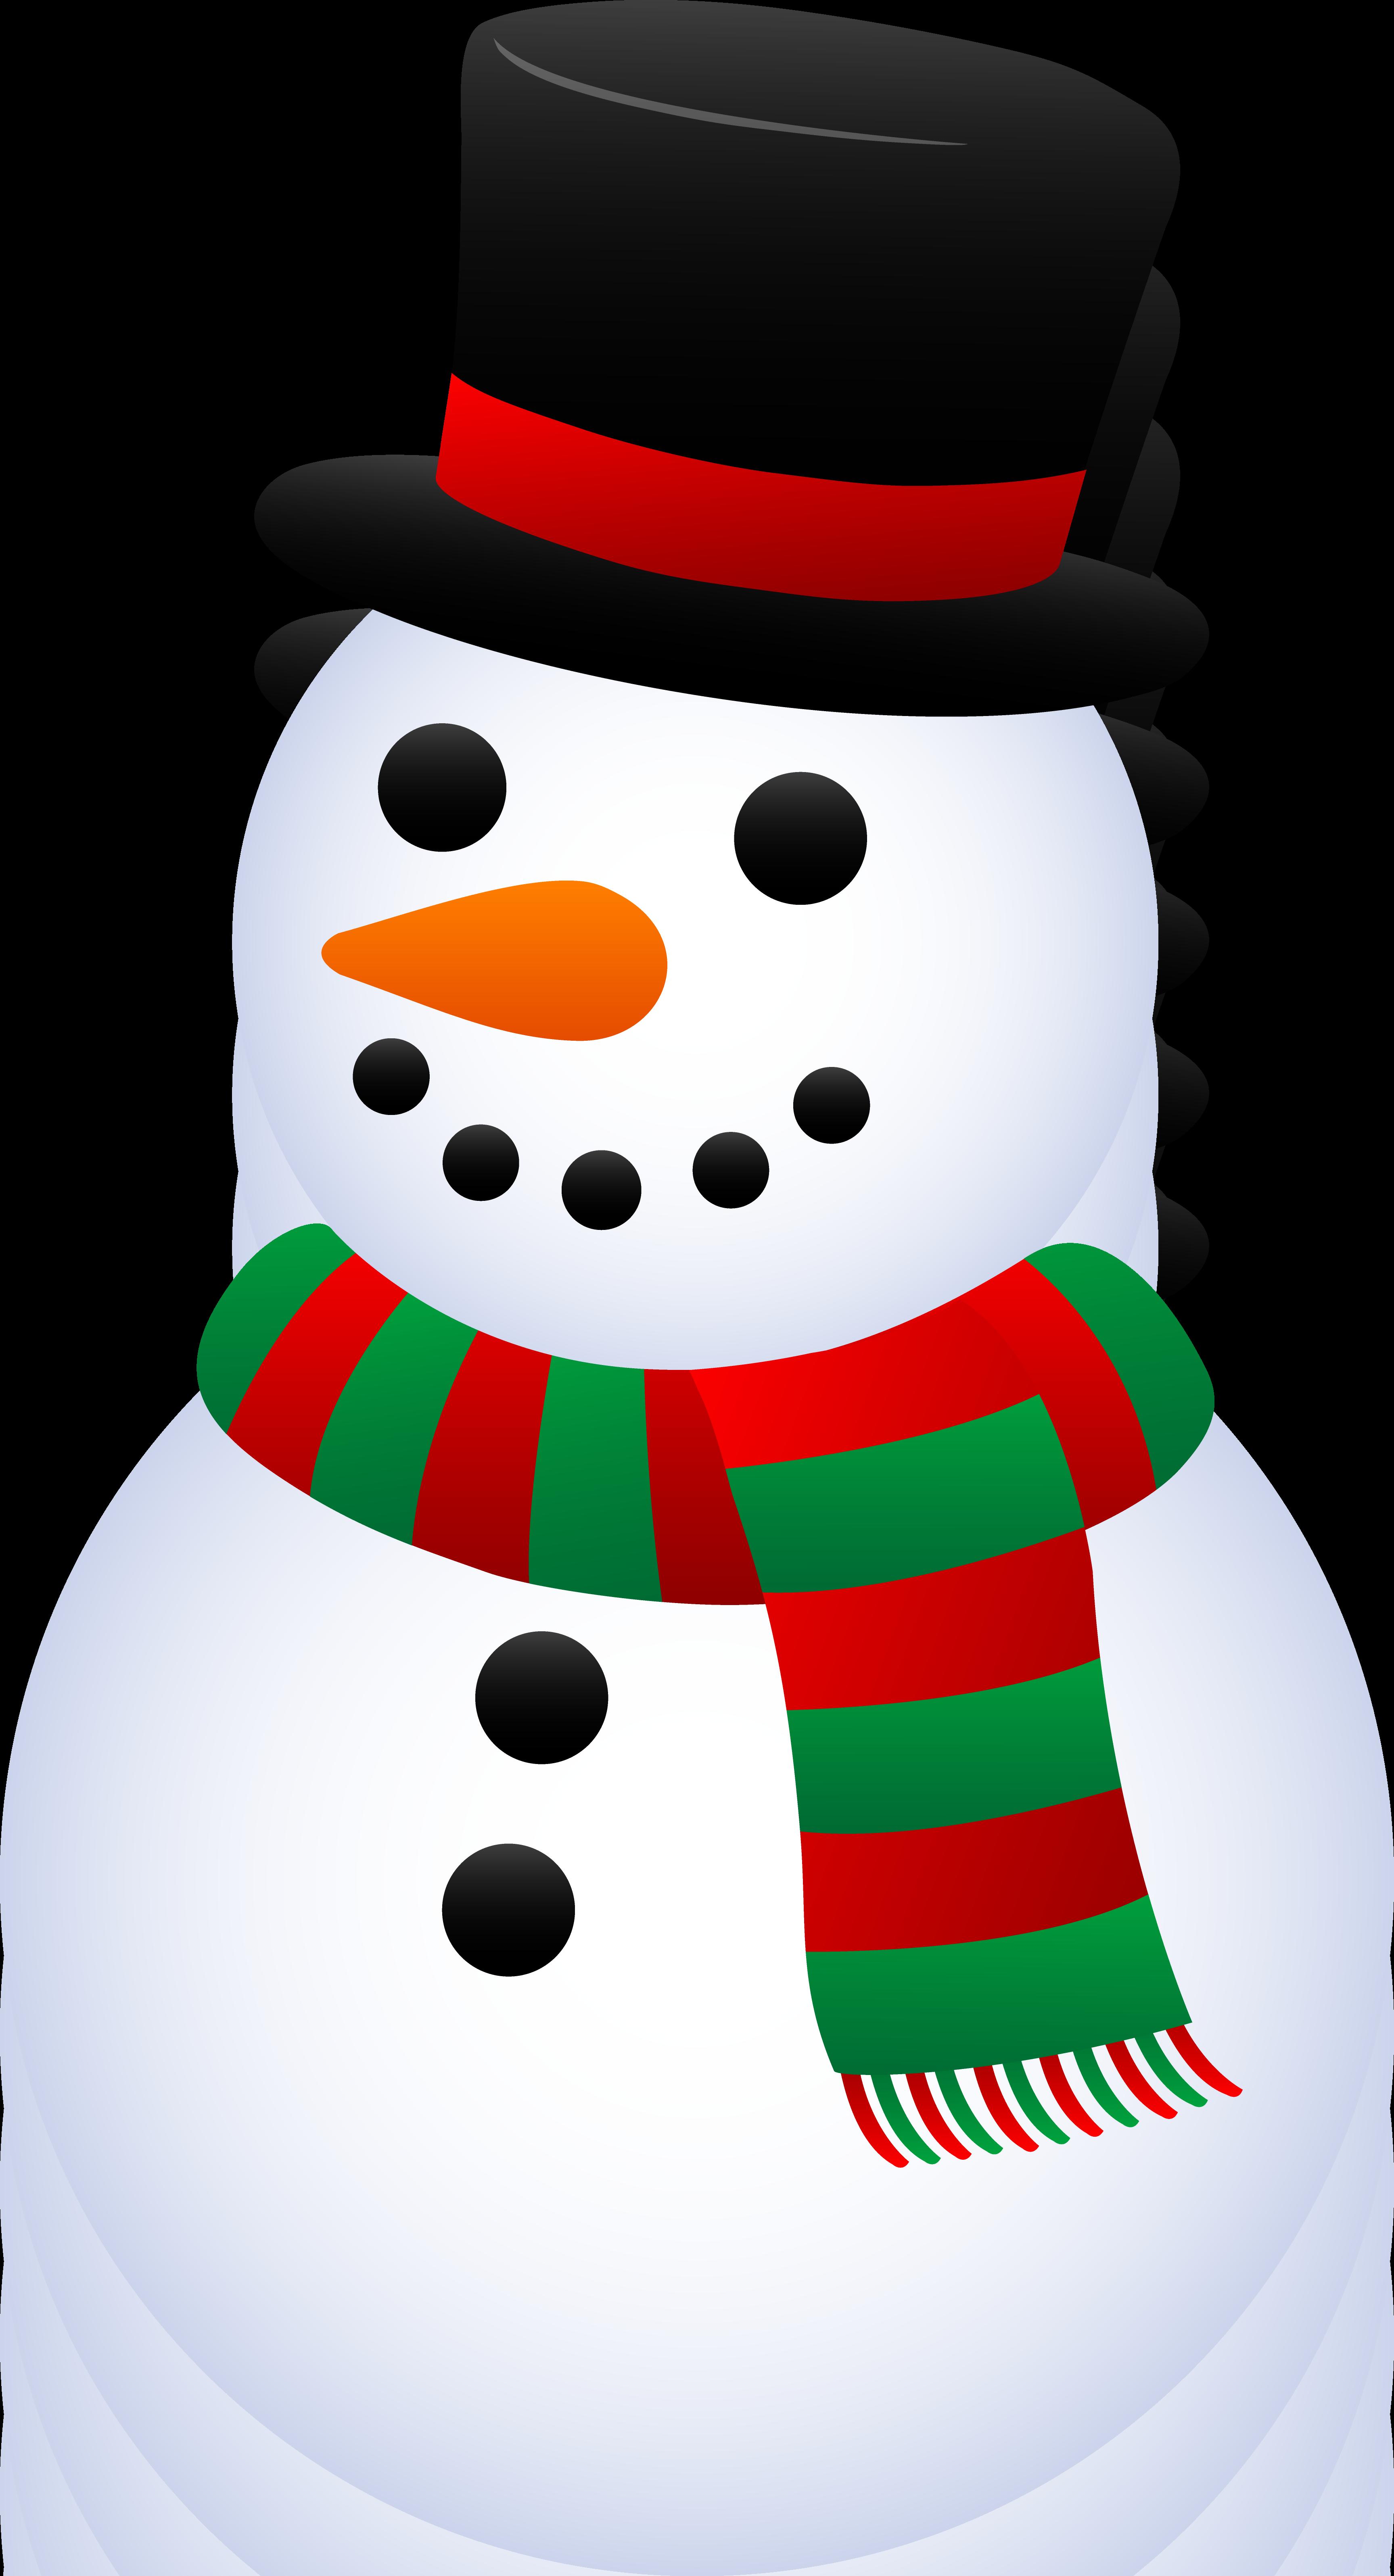 free vector clipart snowman - photo #50